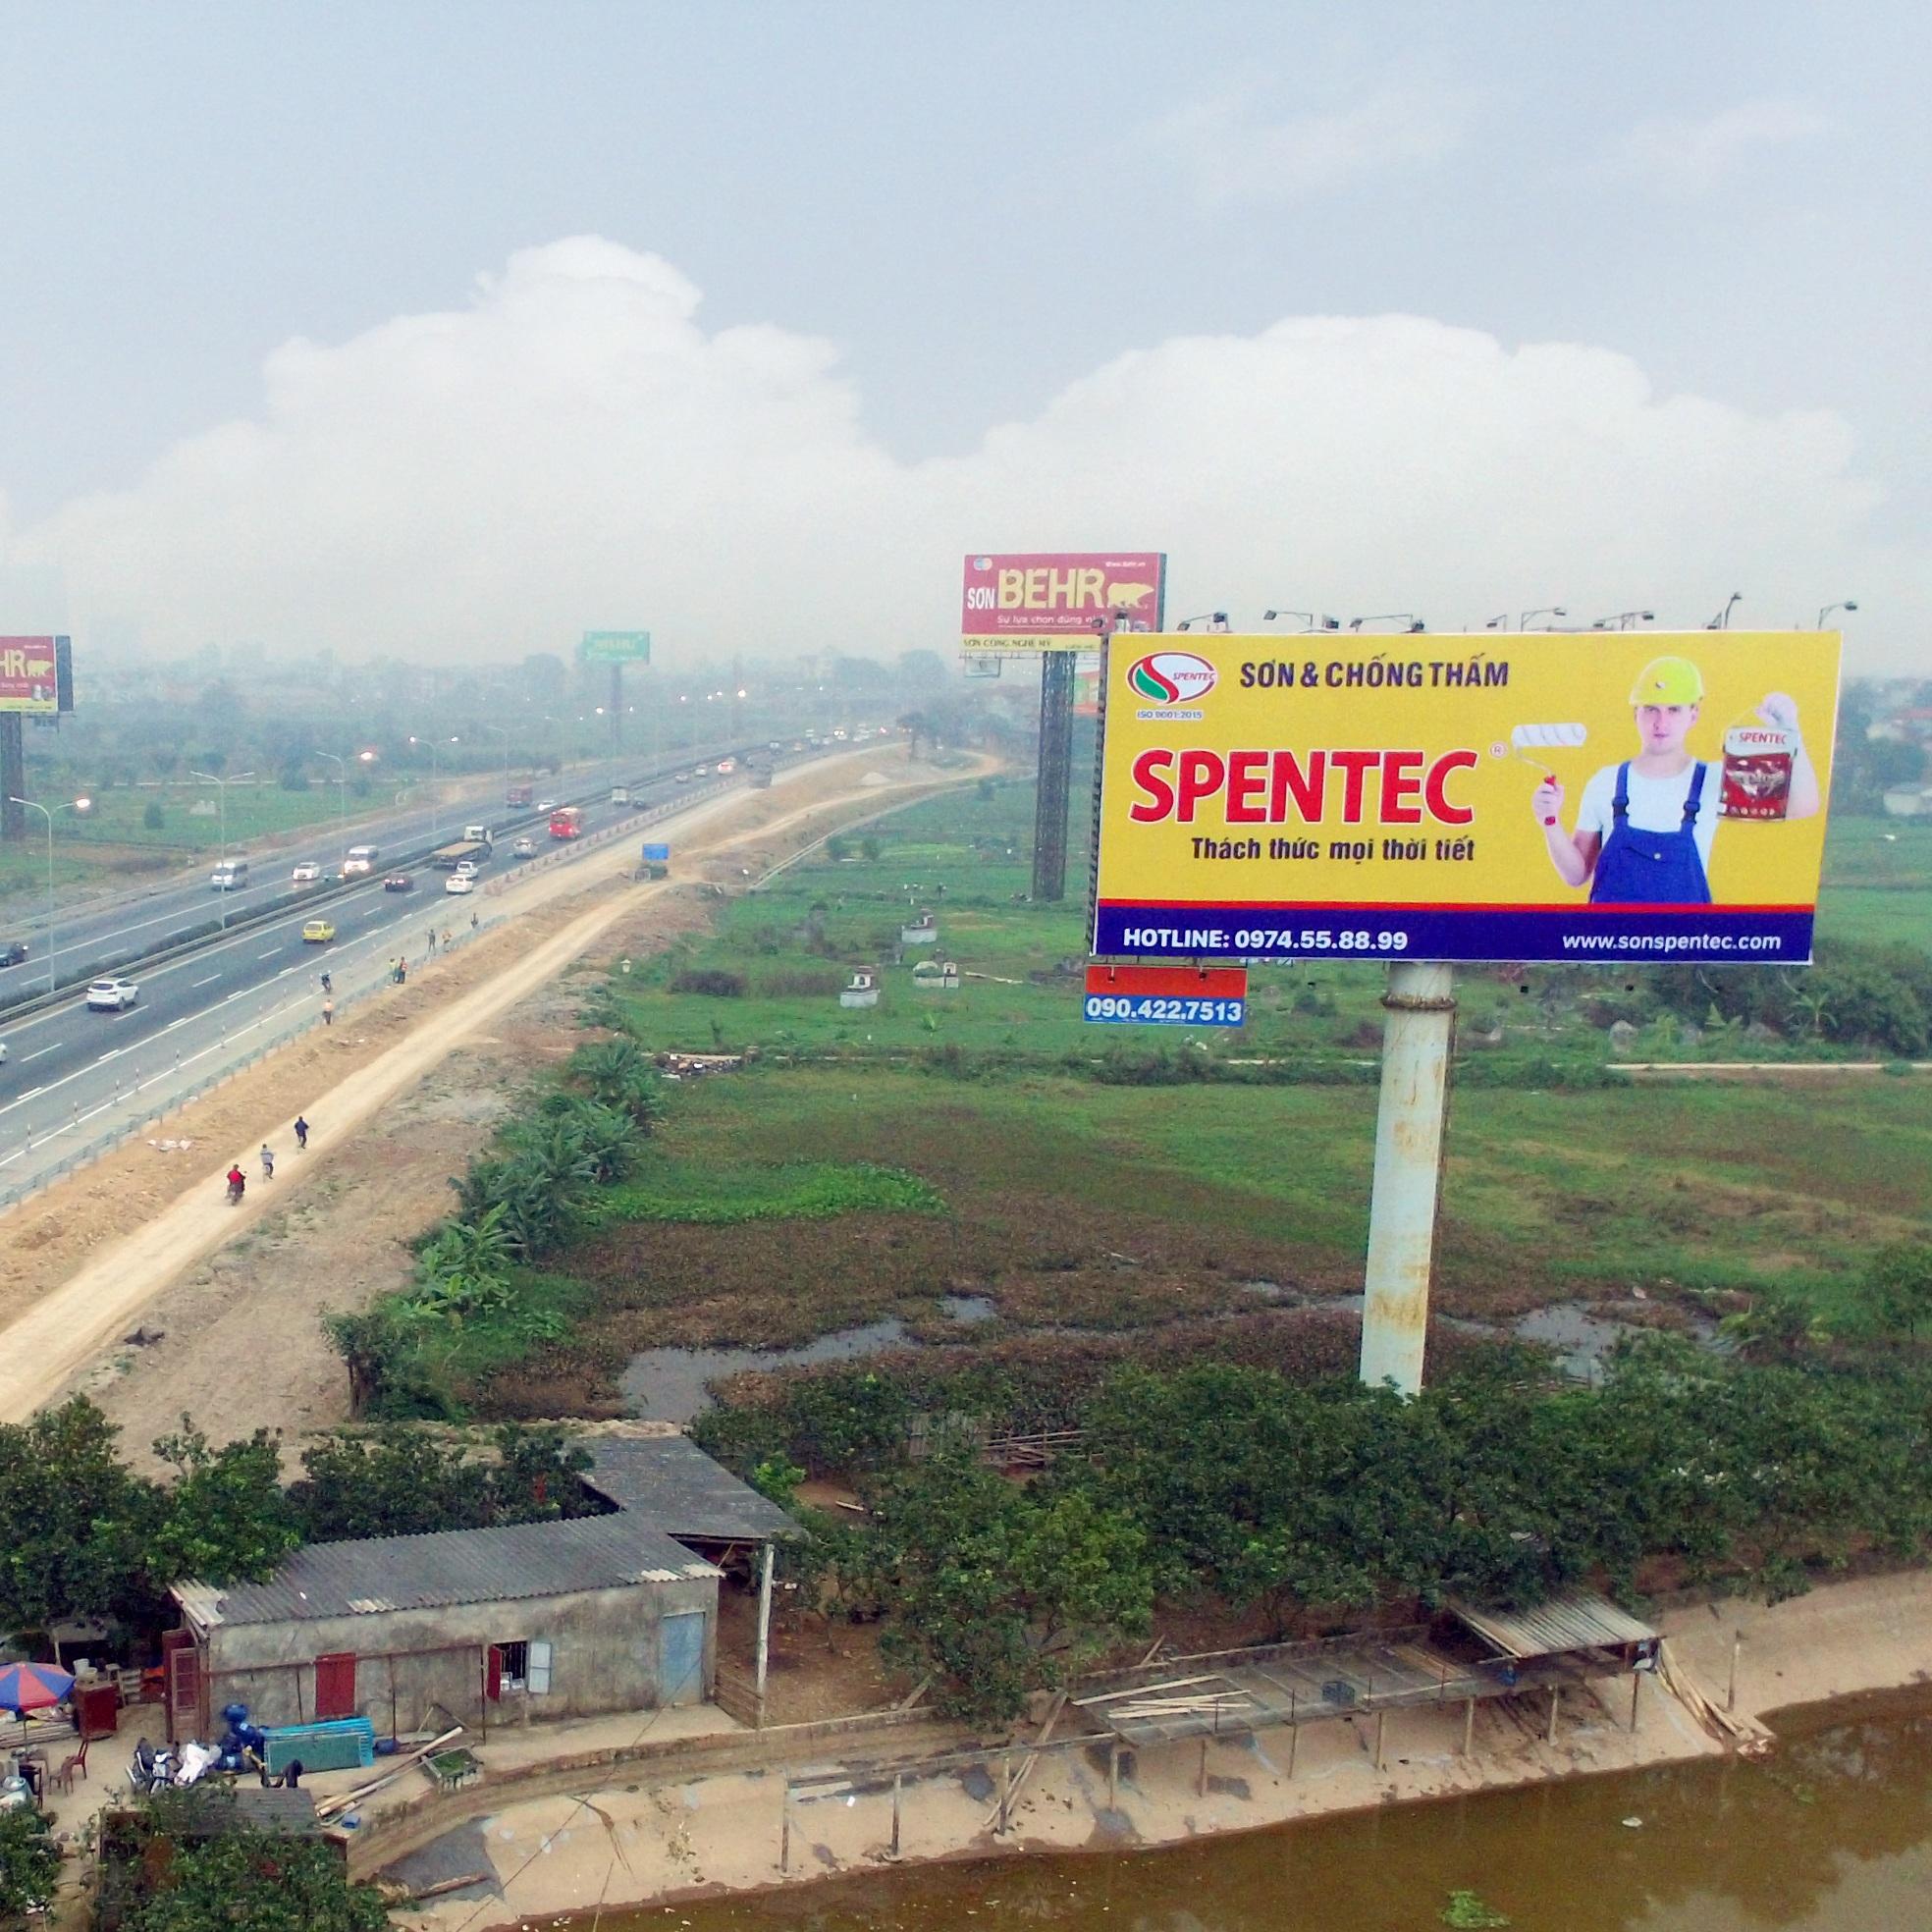 OOH Advertising in Hanoi